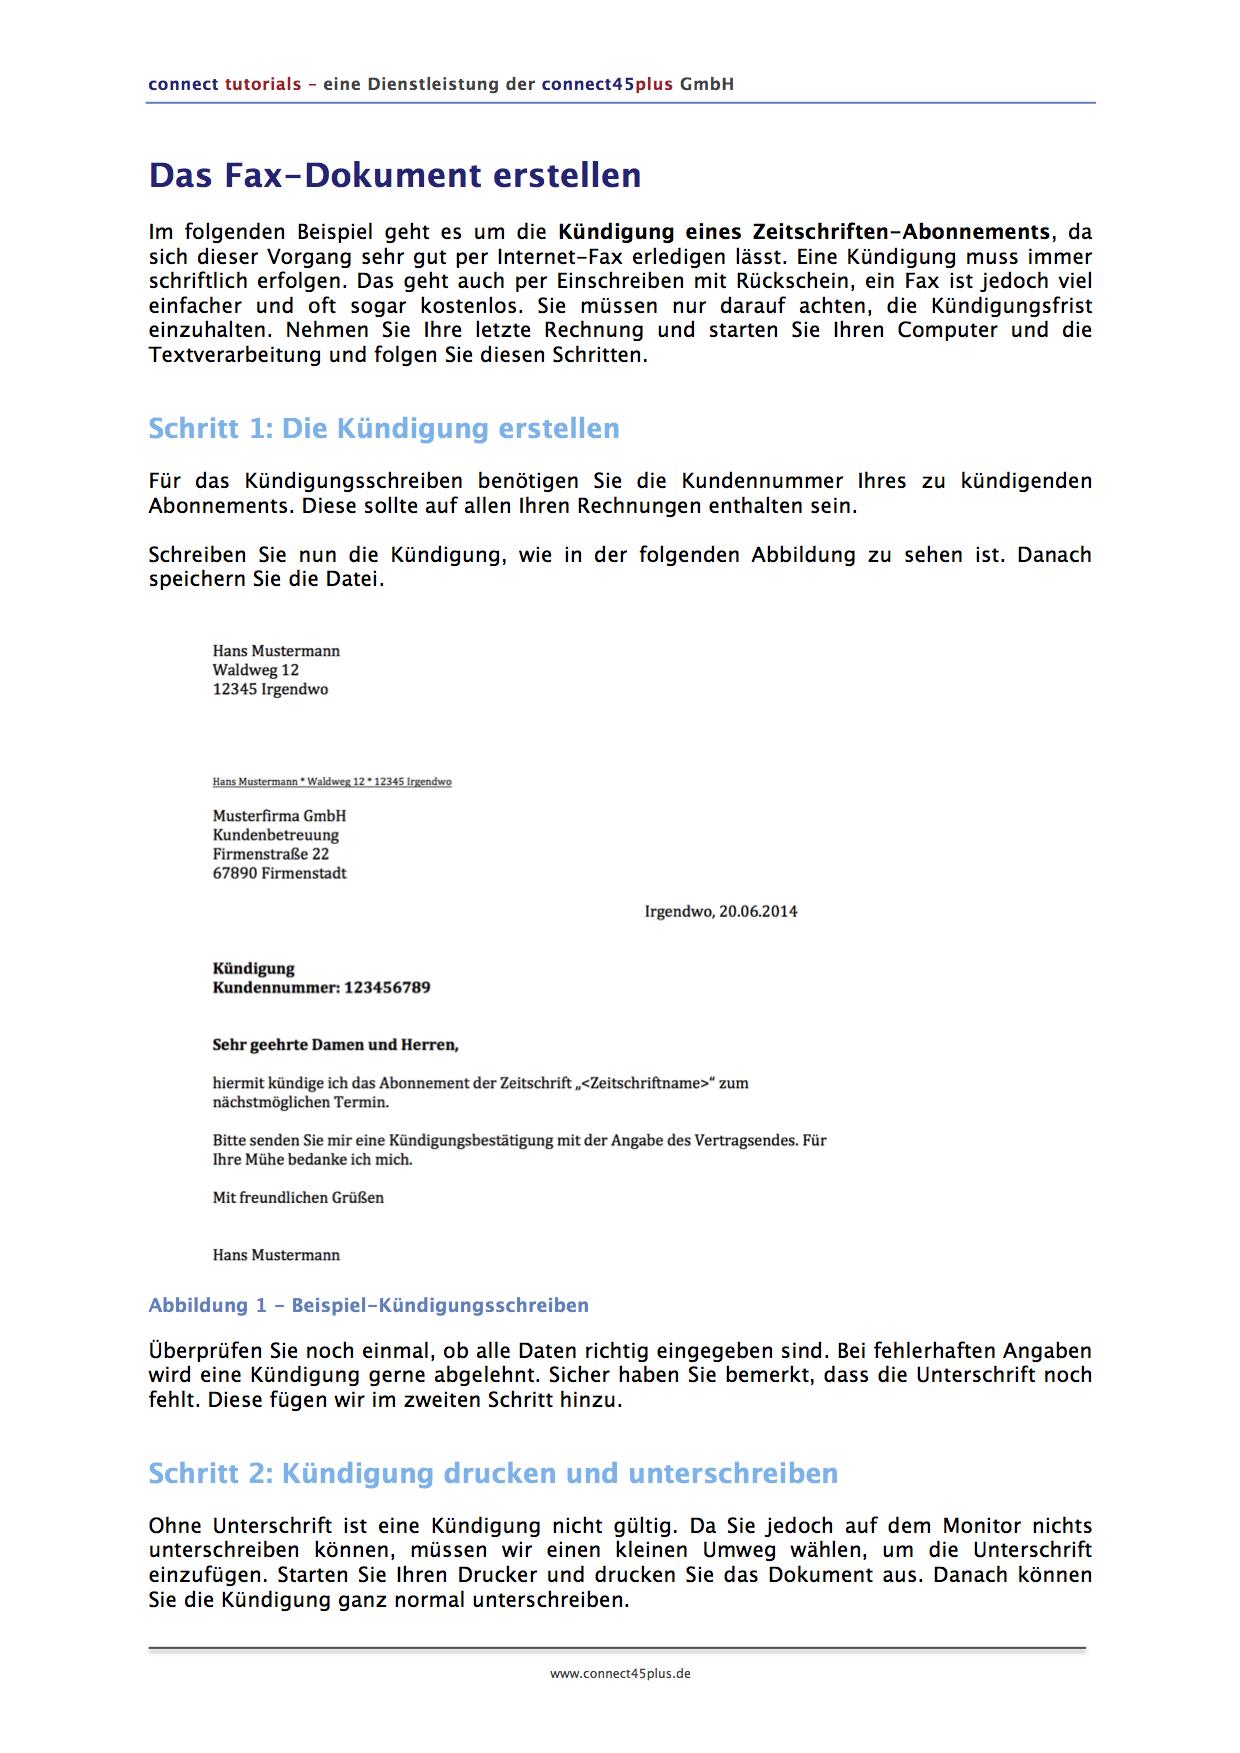 Fax Versenden Anleitung Connect45plus